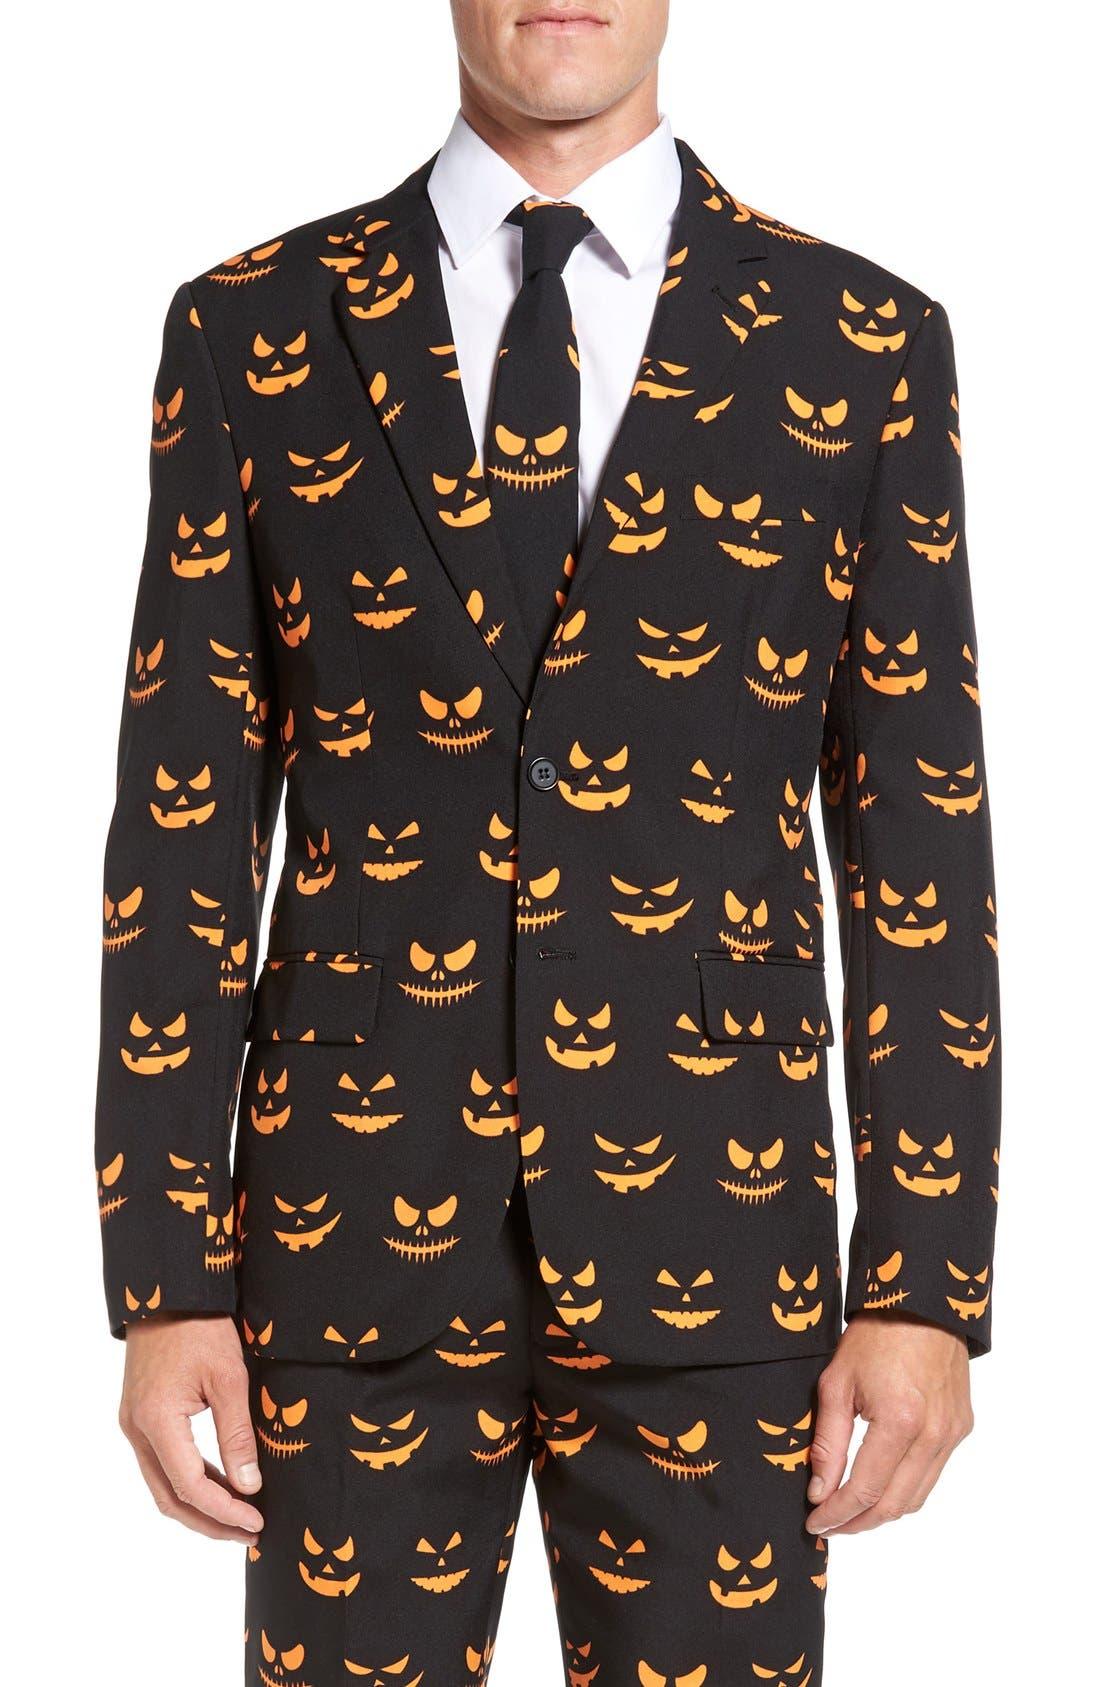 'Black-O Jack-O' Trim Fit Suit with Tie,                             Alternate thumbnail 6, color,